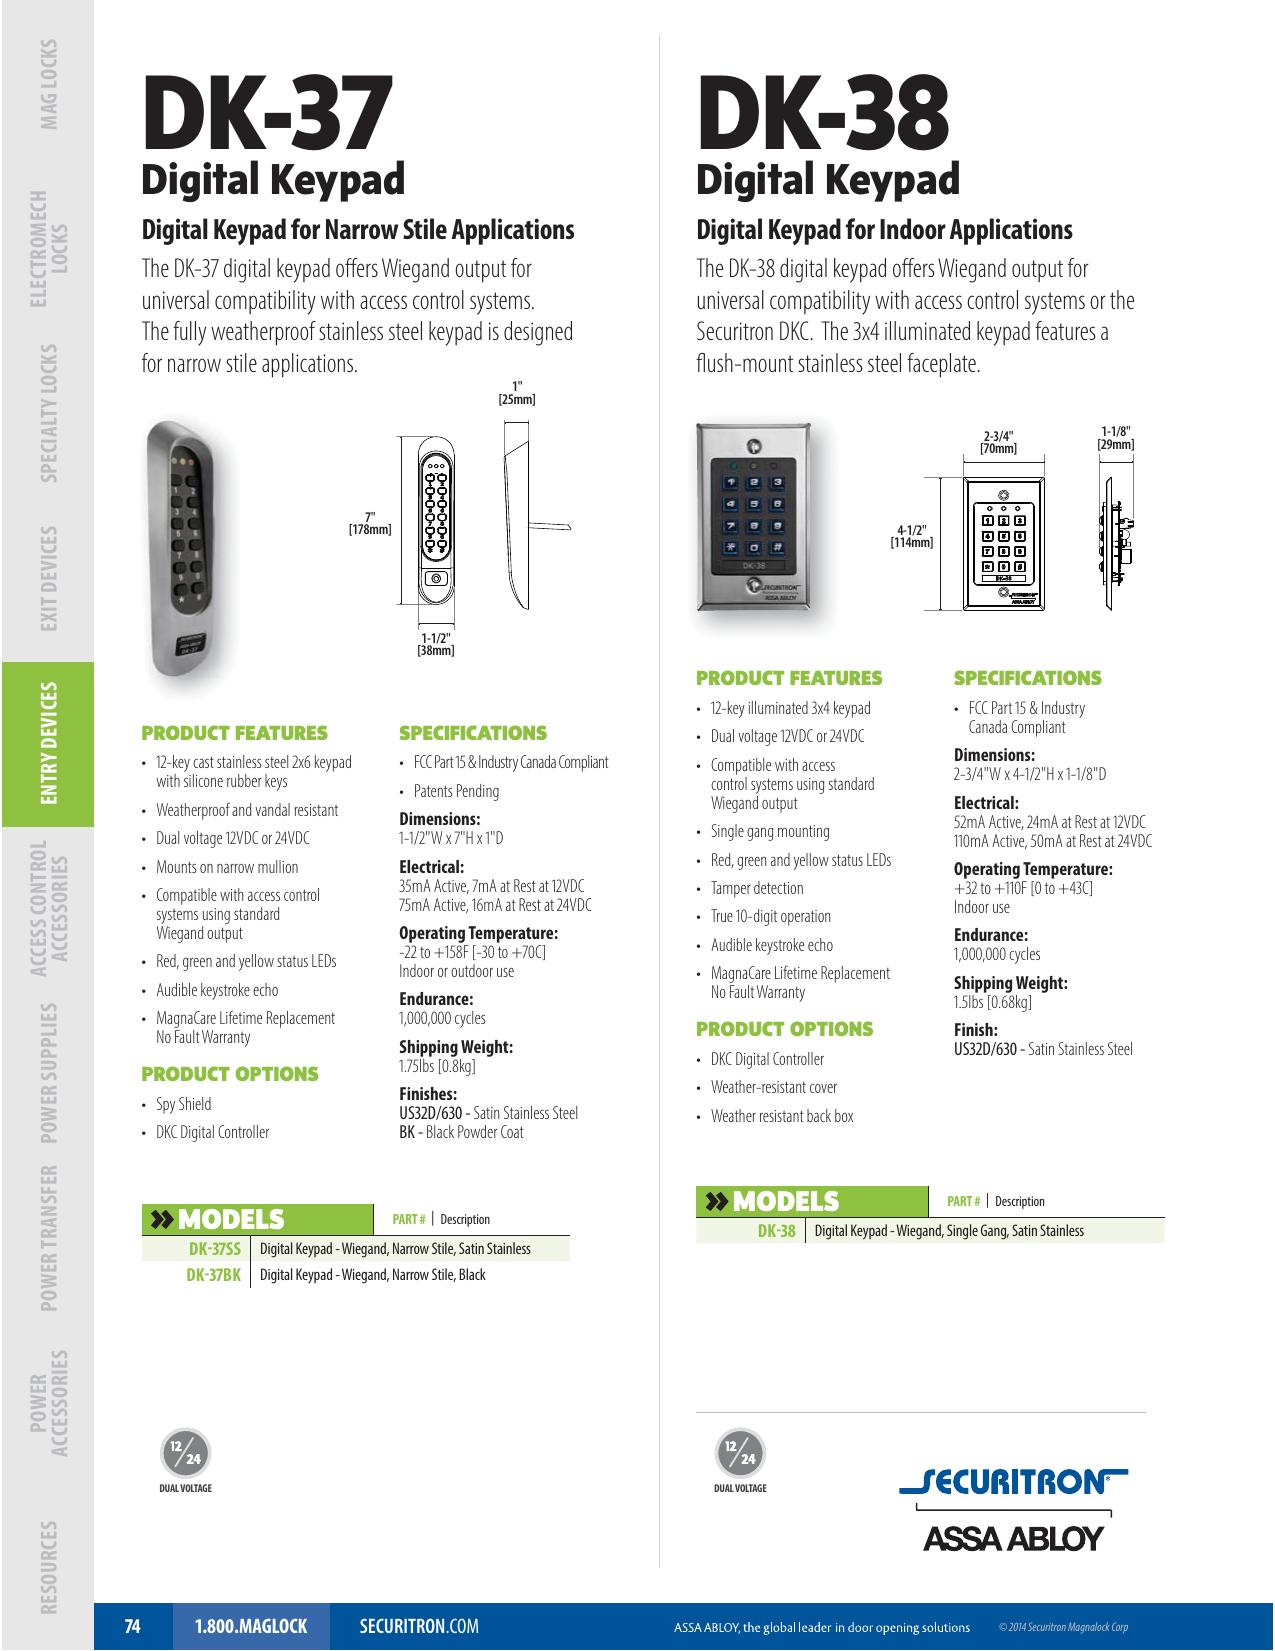 Securitron Stainless Steel Narrow Stile Digital Keypad System Satin Stainless Finish